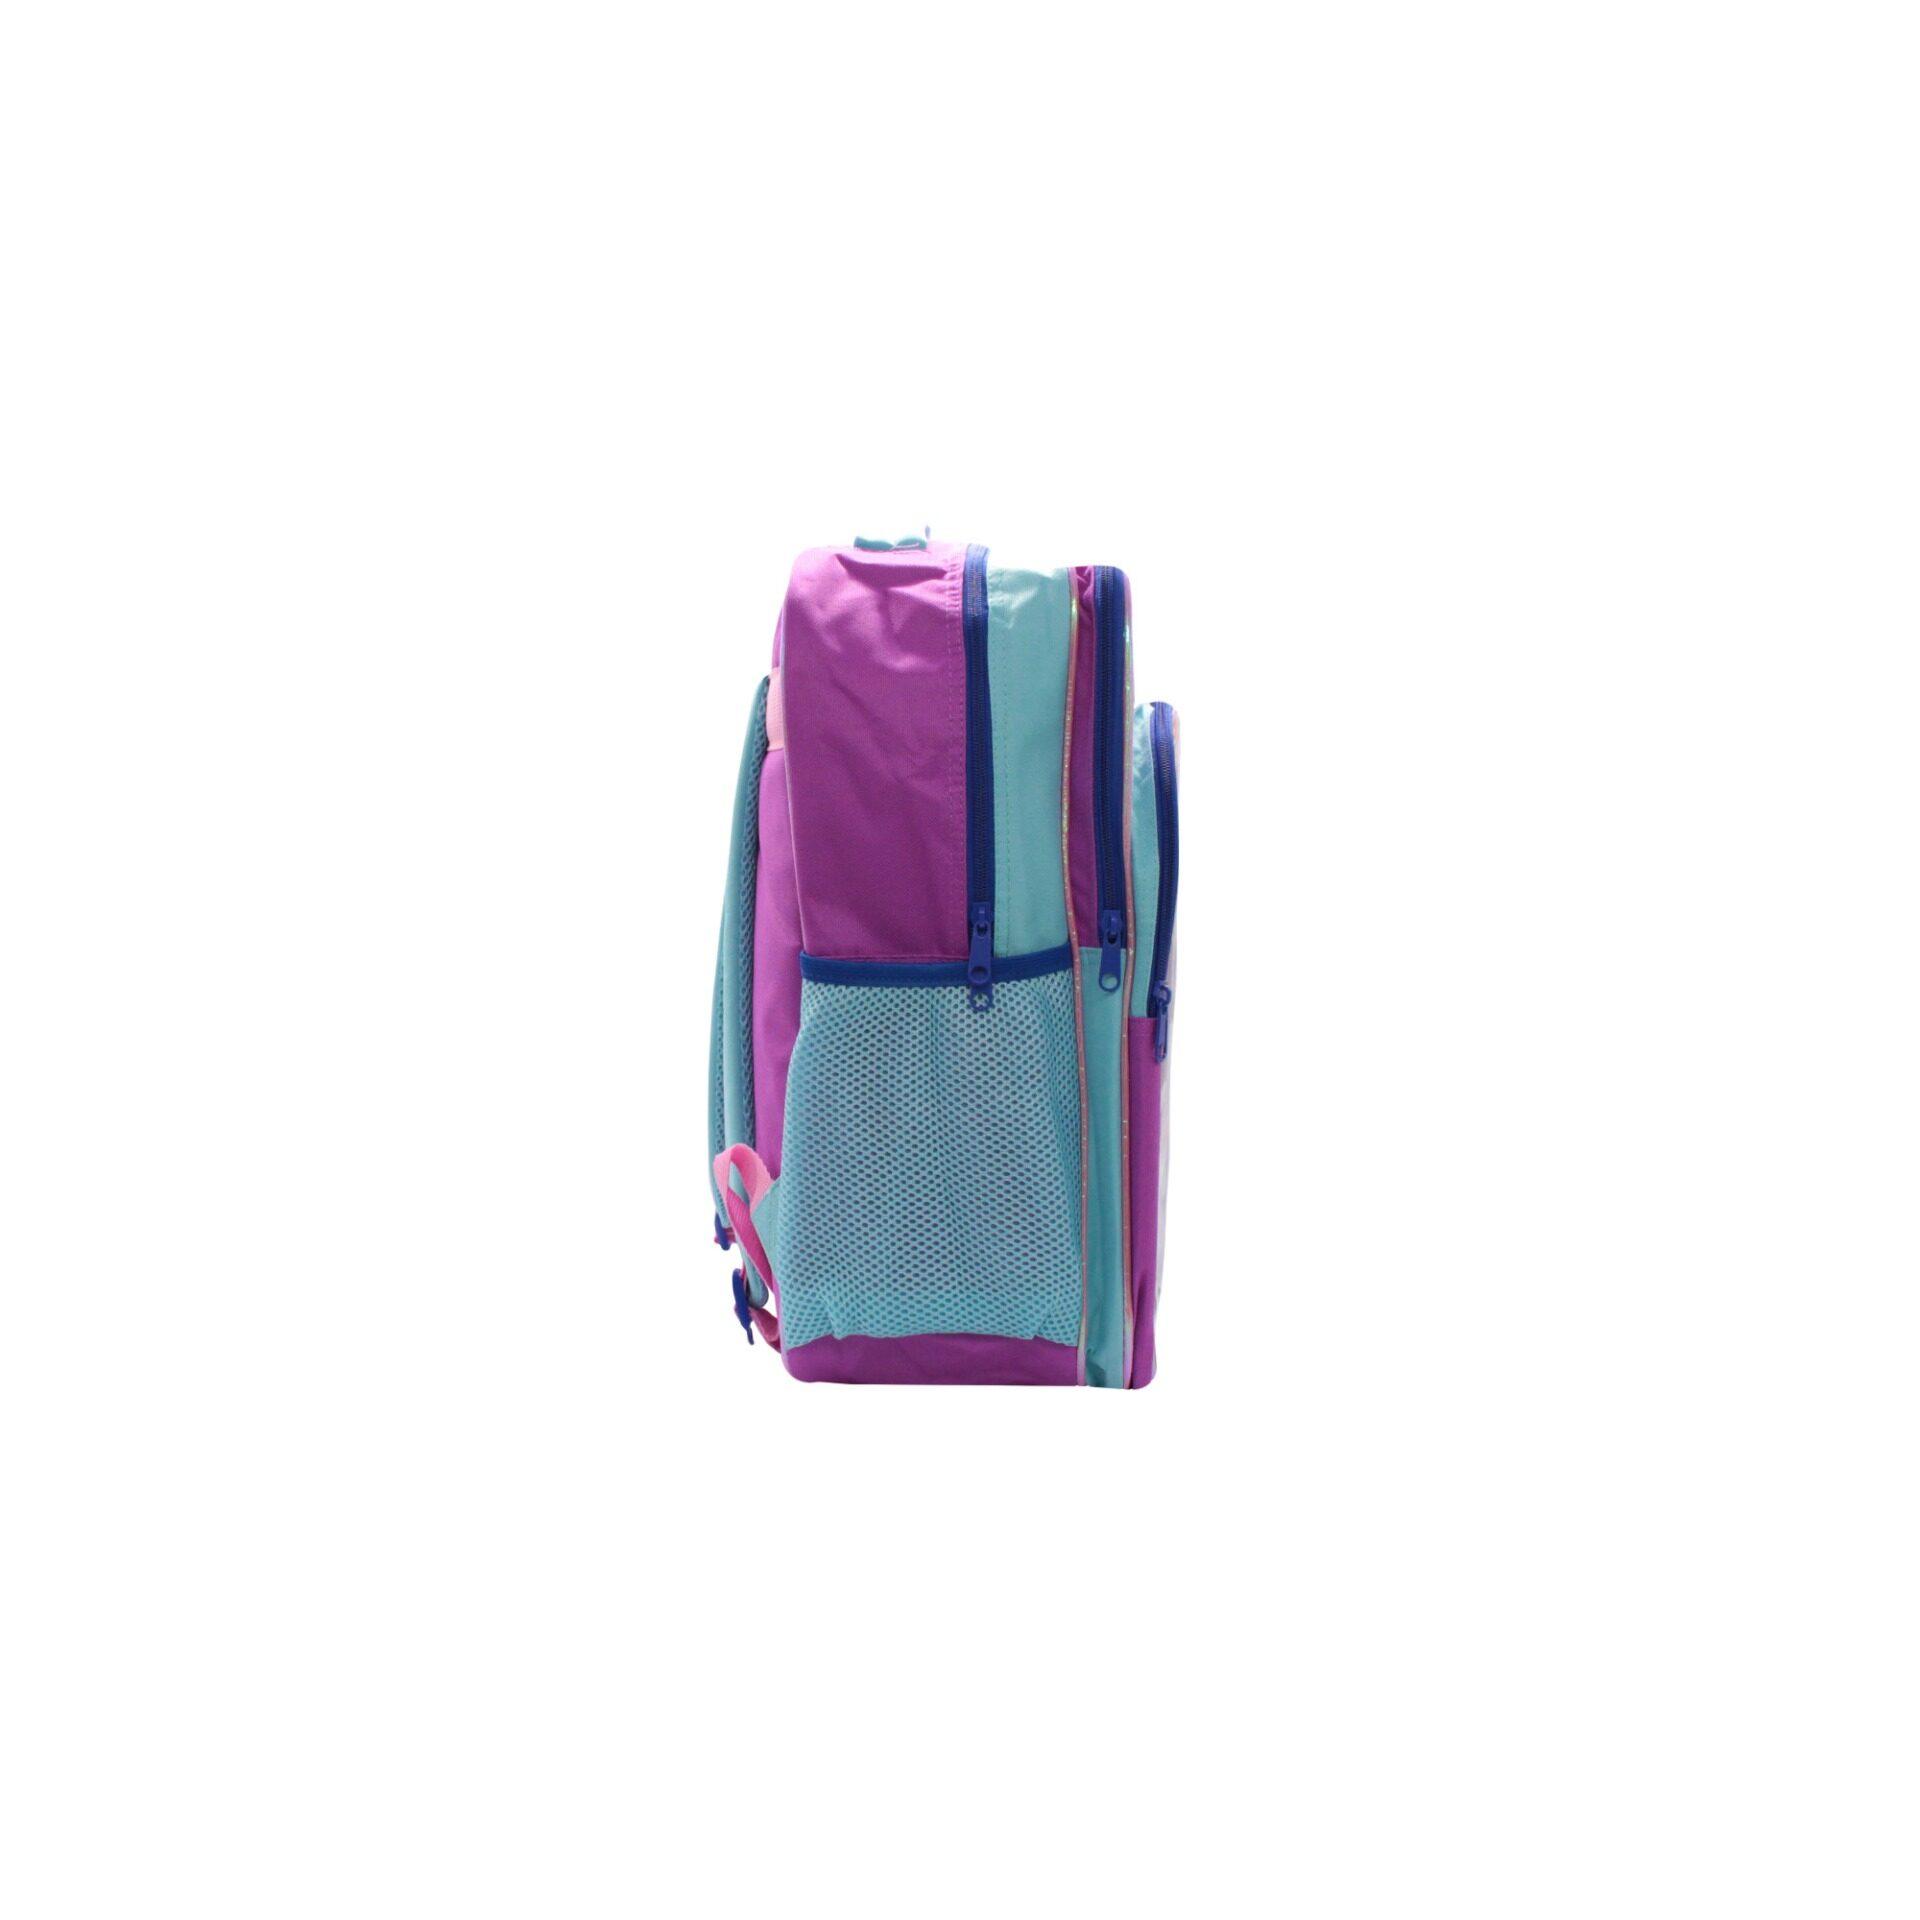 Disney Frozen 2 Princess Elsa Anna & Olaf Destiny Awaits With Front Zipper Pouch Kids Girls School Bag (Purple & Turqoise) Age 7 Years & Above